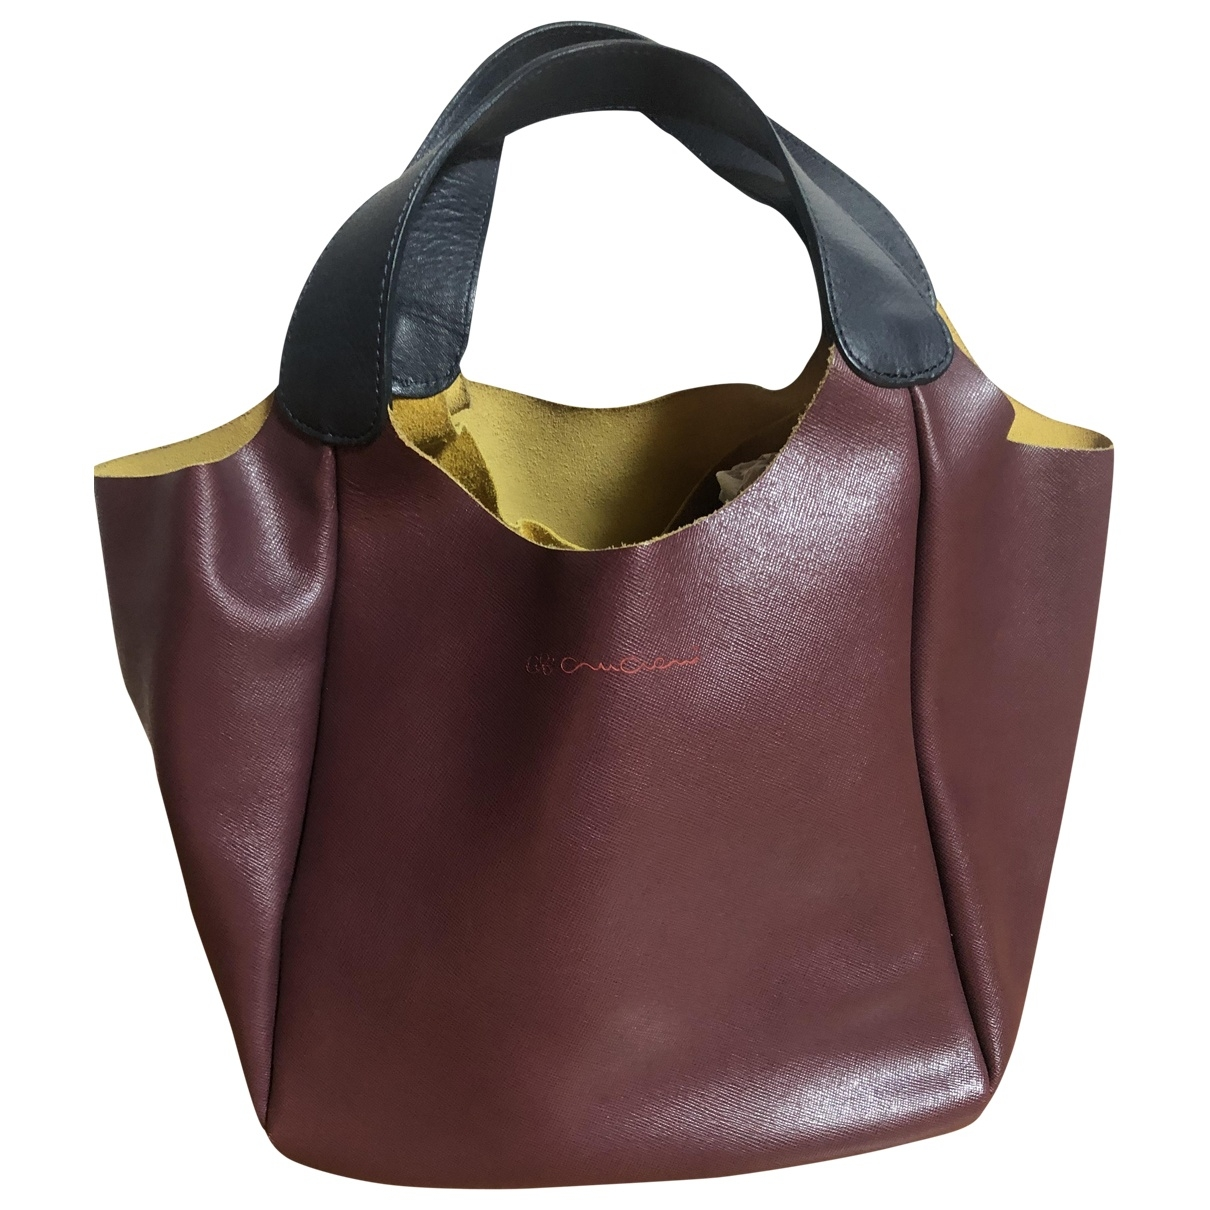 Cruciani \N Burgundy Leather handbag for Women \N